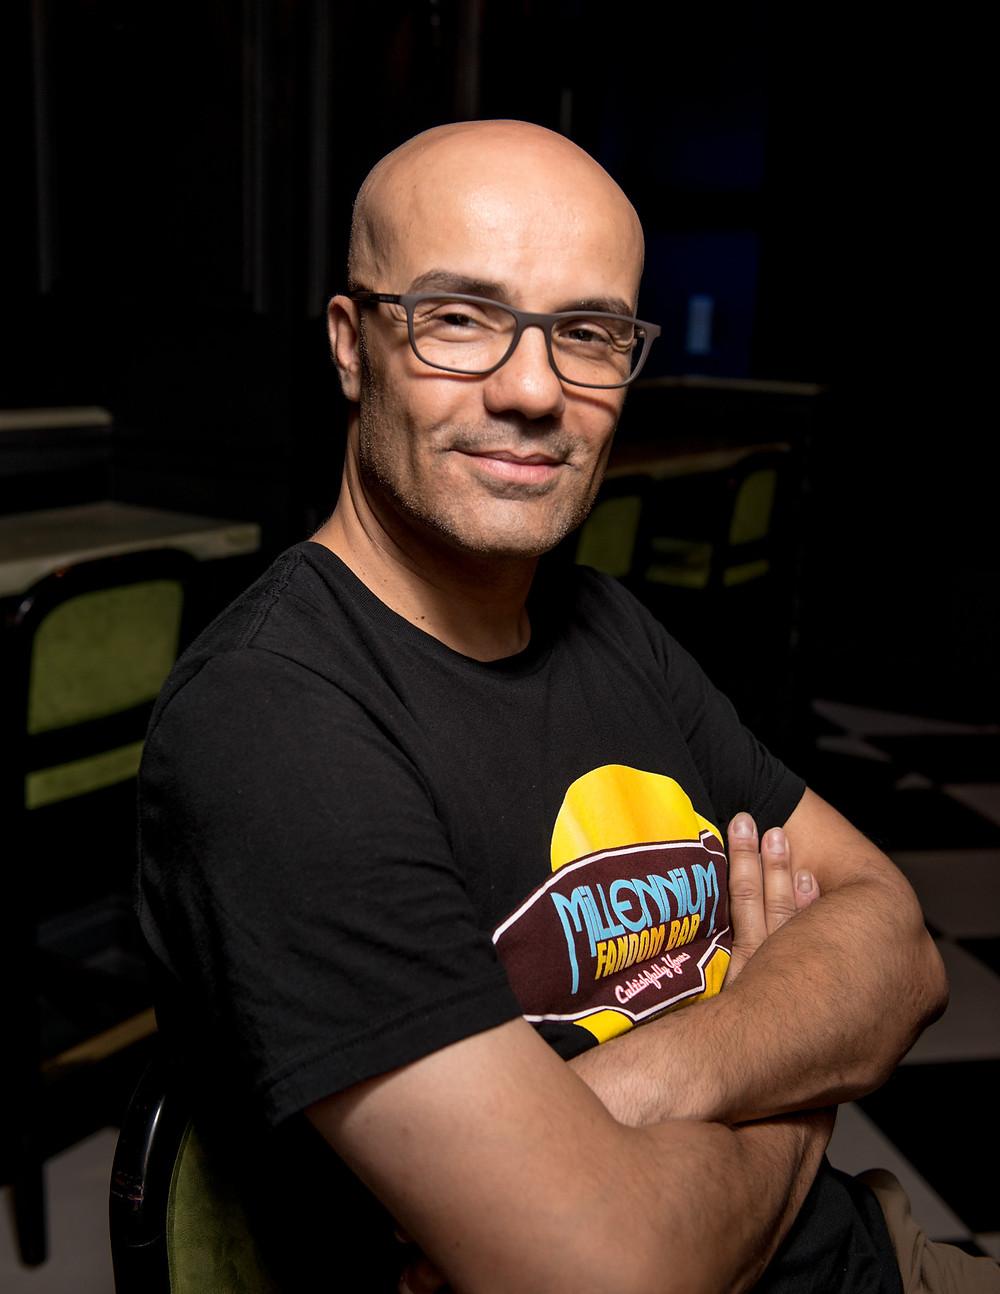 Alex Pusineri, Founder & Owner of the Millennium Fandom Bar, Las Vegas, United States of America, at Your Fandom Service!